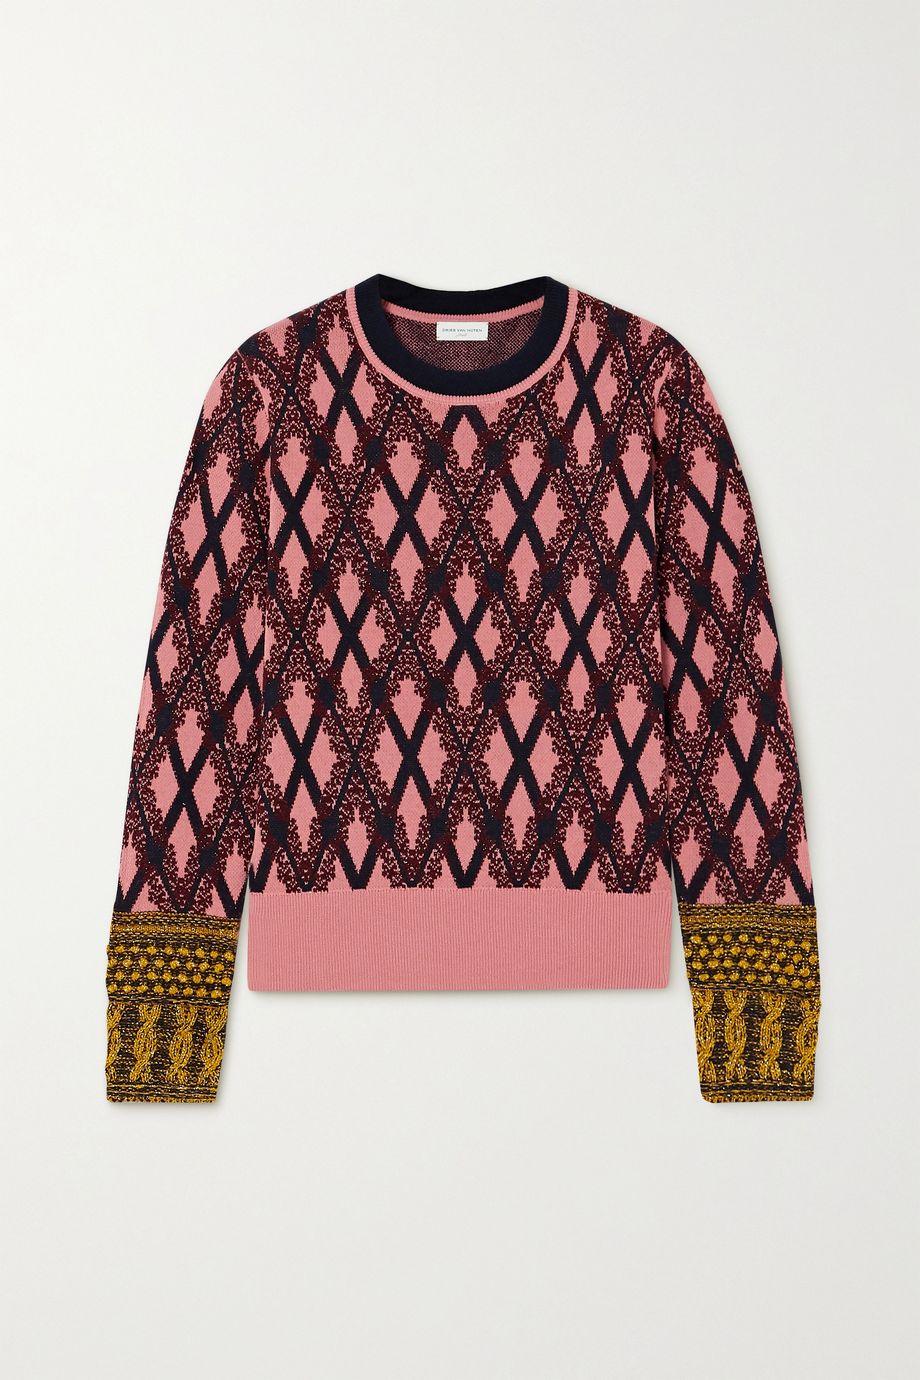 Dries Van Noten Embroidered metallic argyle knitted sweater